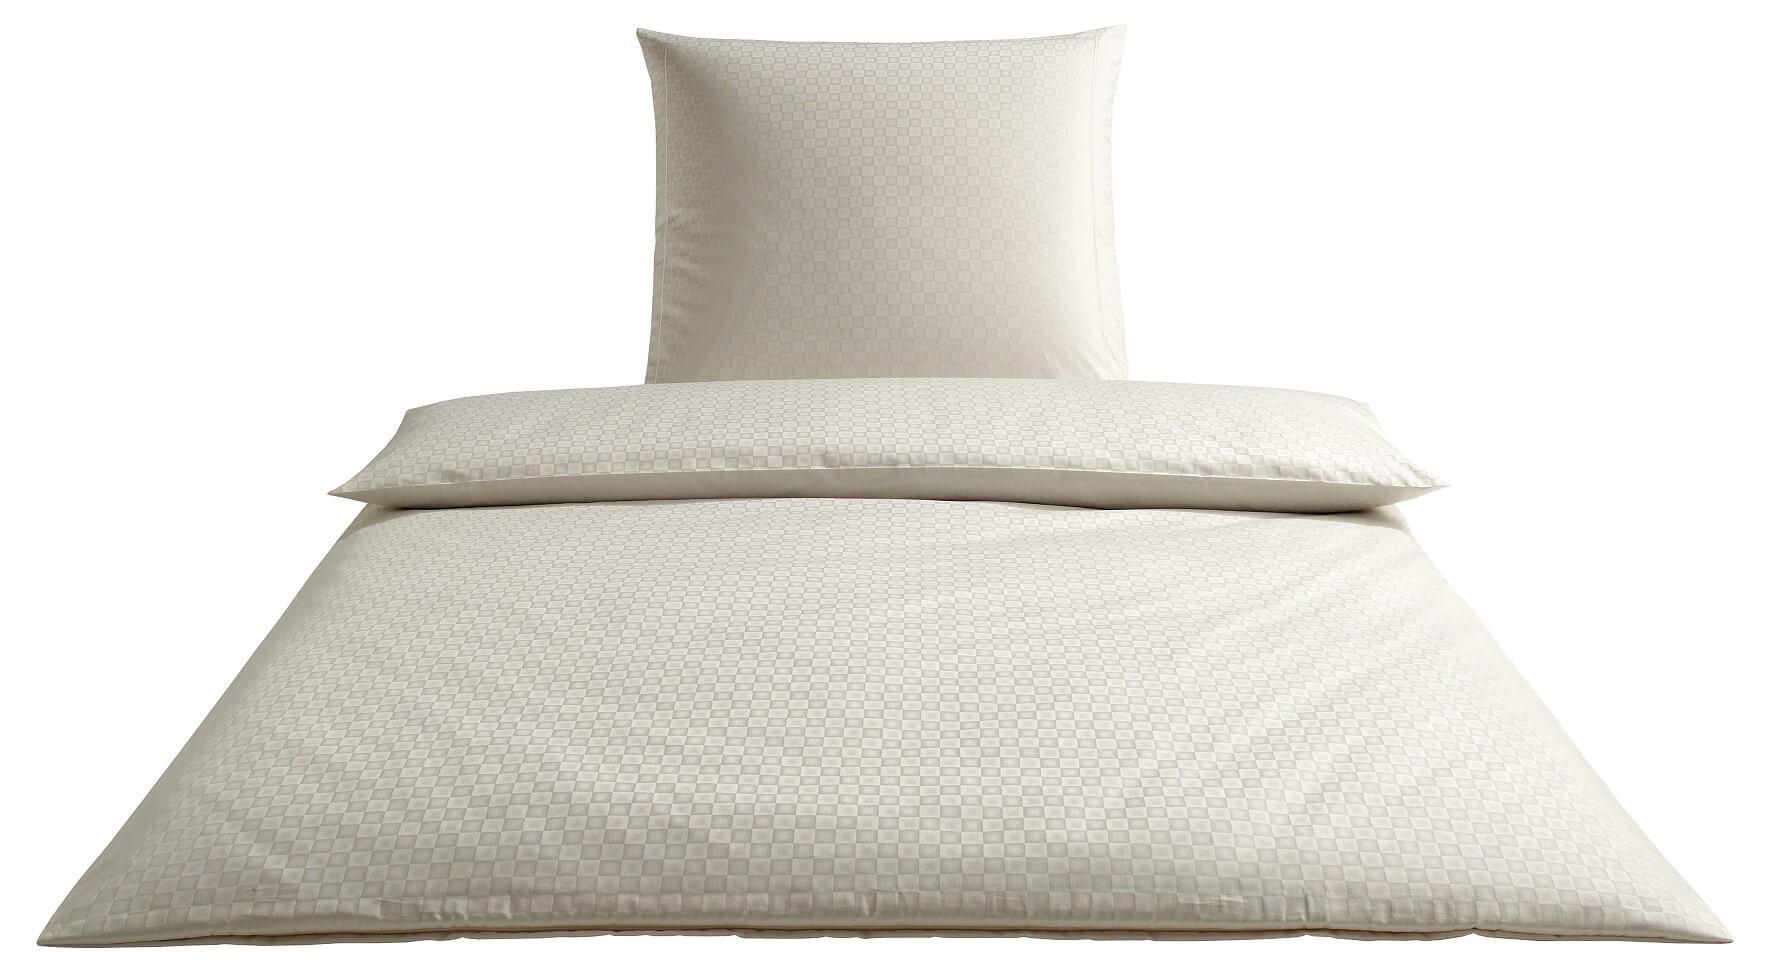 bettw sche elegante cronos 2182 natur. Black Bedroom Furniture Sets. Home Design Ideas